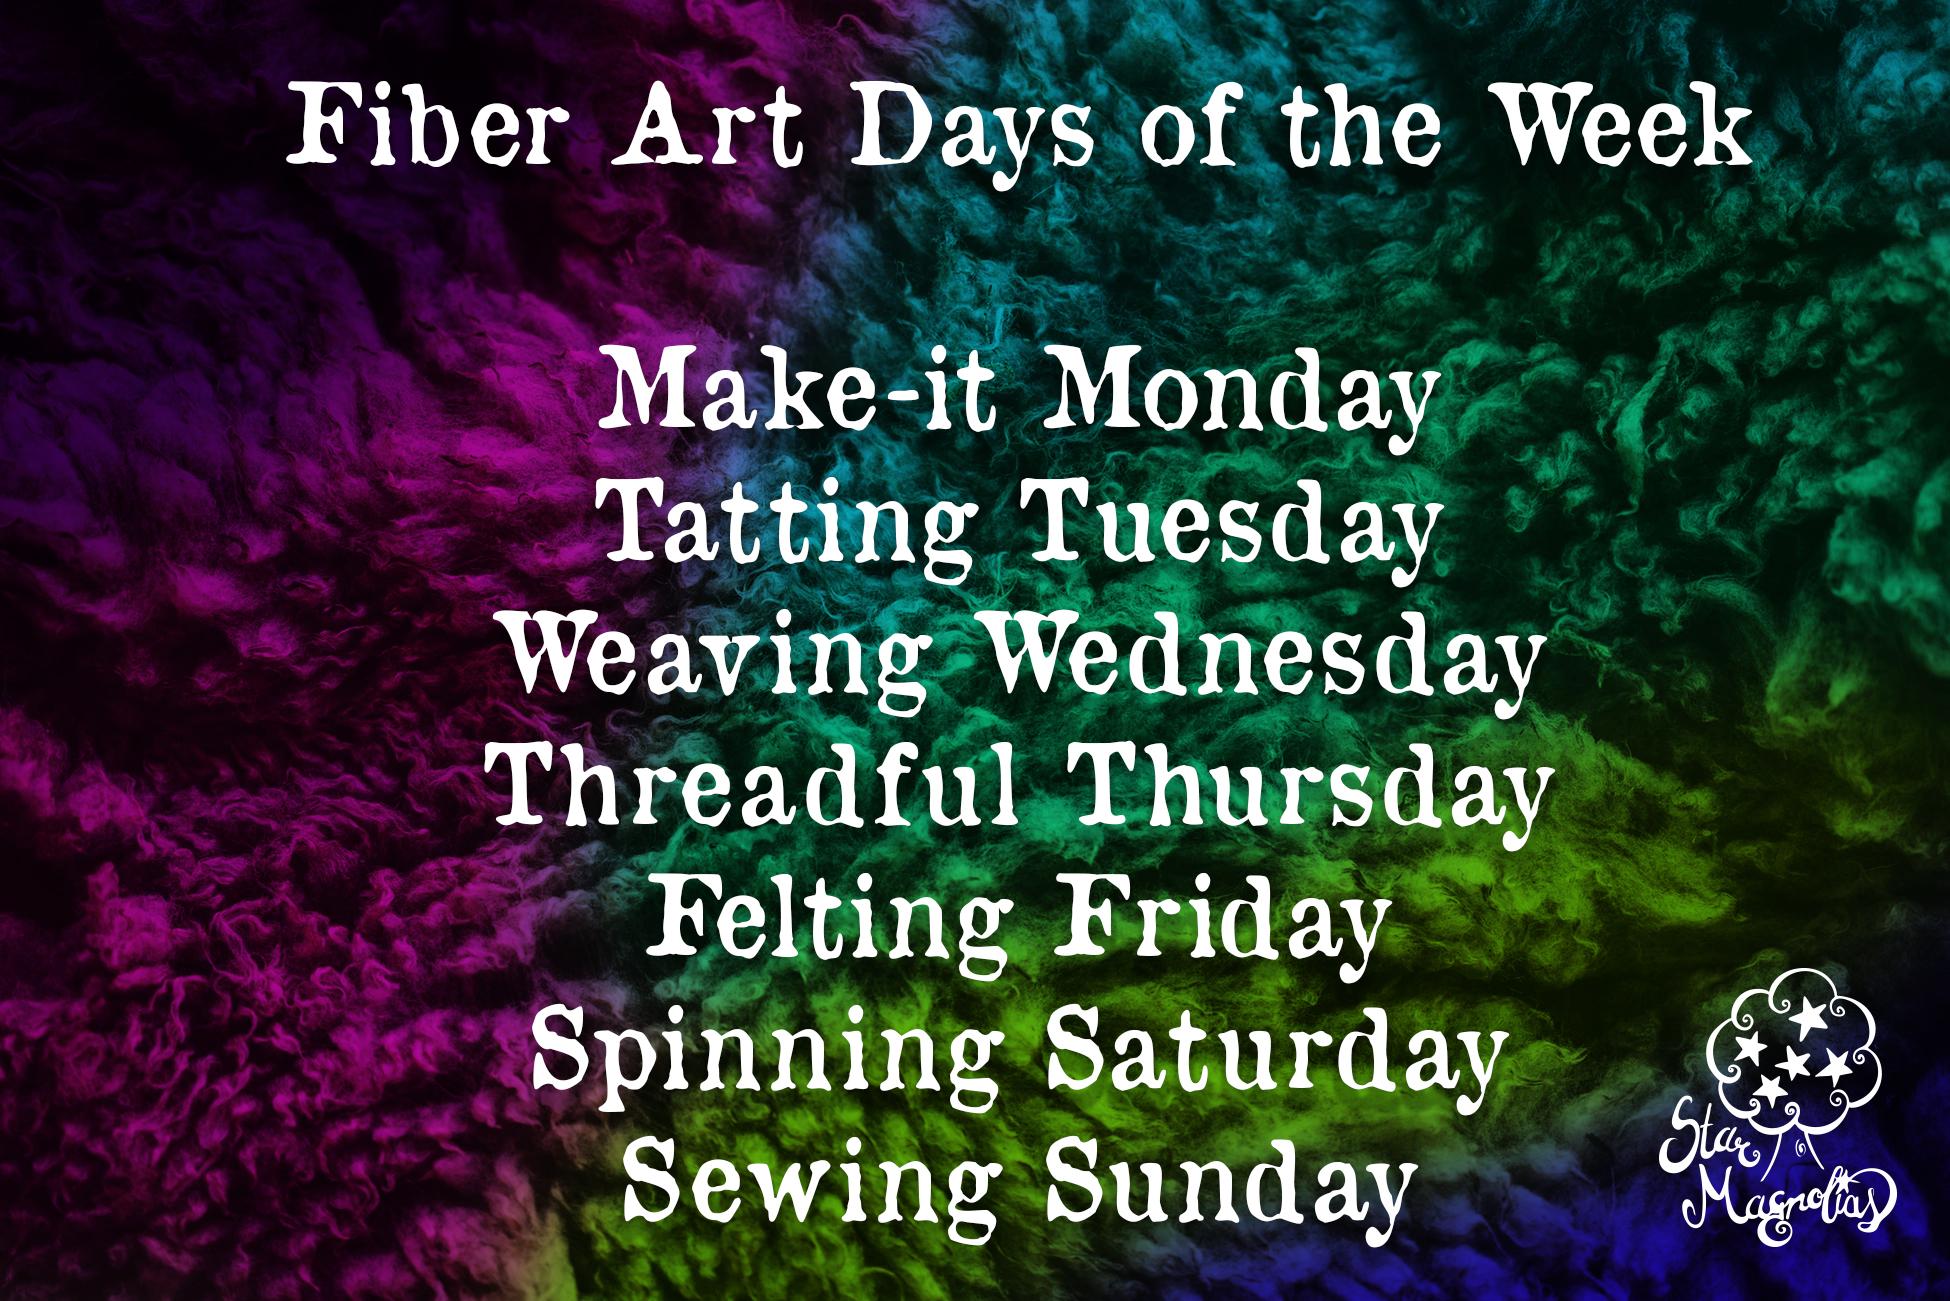 Fiber art days of the week: Make-it Monday, Tatting Tuesday, Weaving Wednesday, Threadful Thursday, Felting Friday, Spinning Saturday, Sewing Sunday